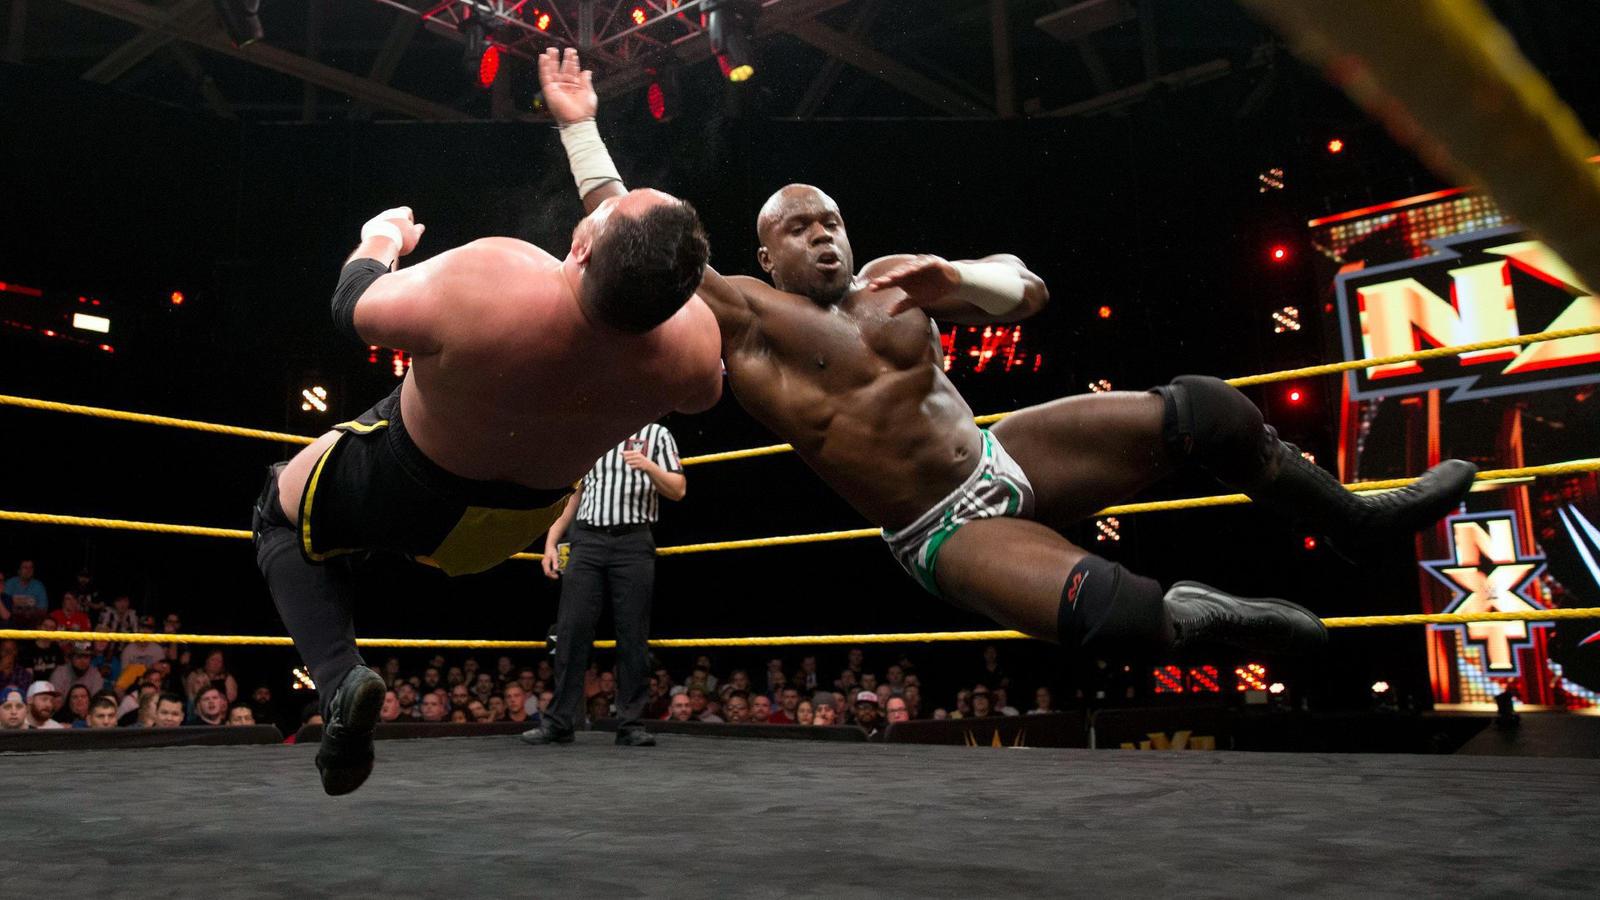 Resultats WWE NXT 20 avril